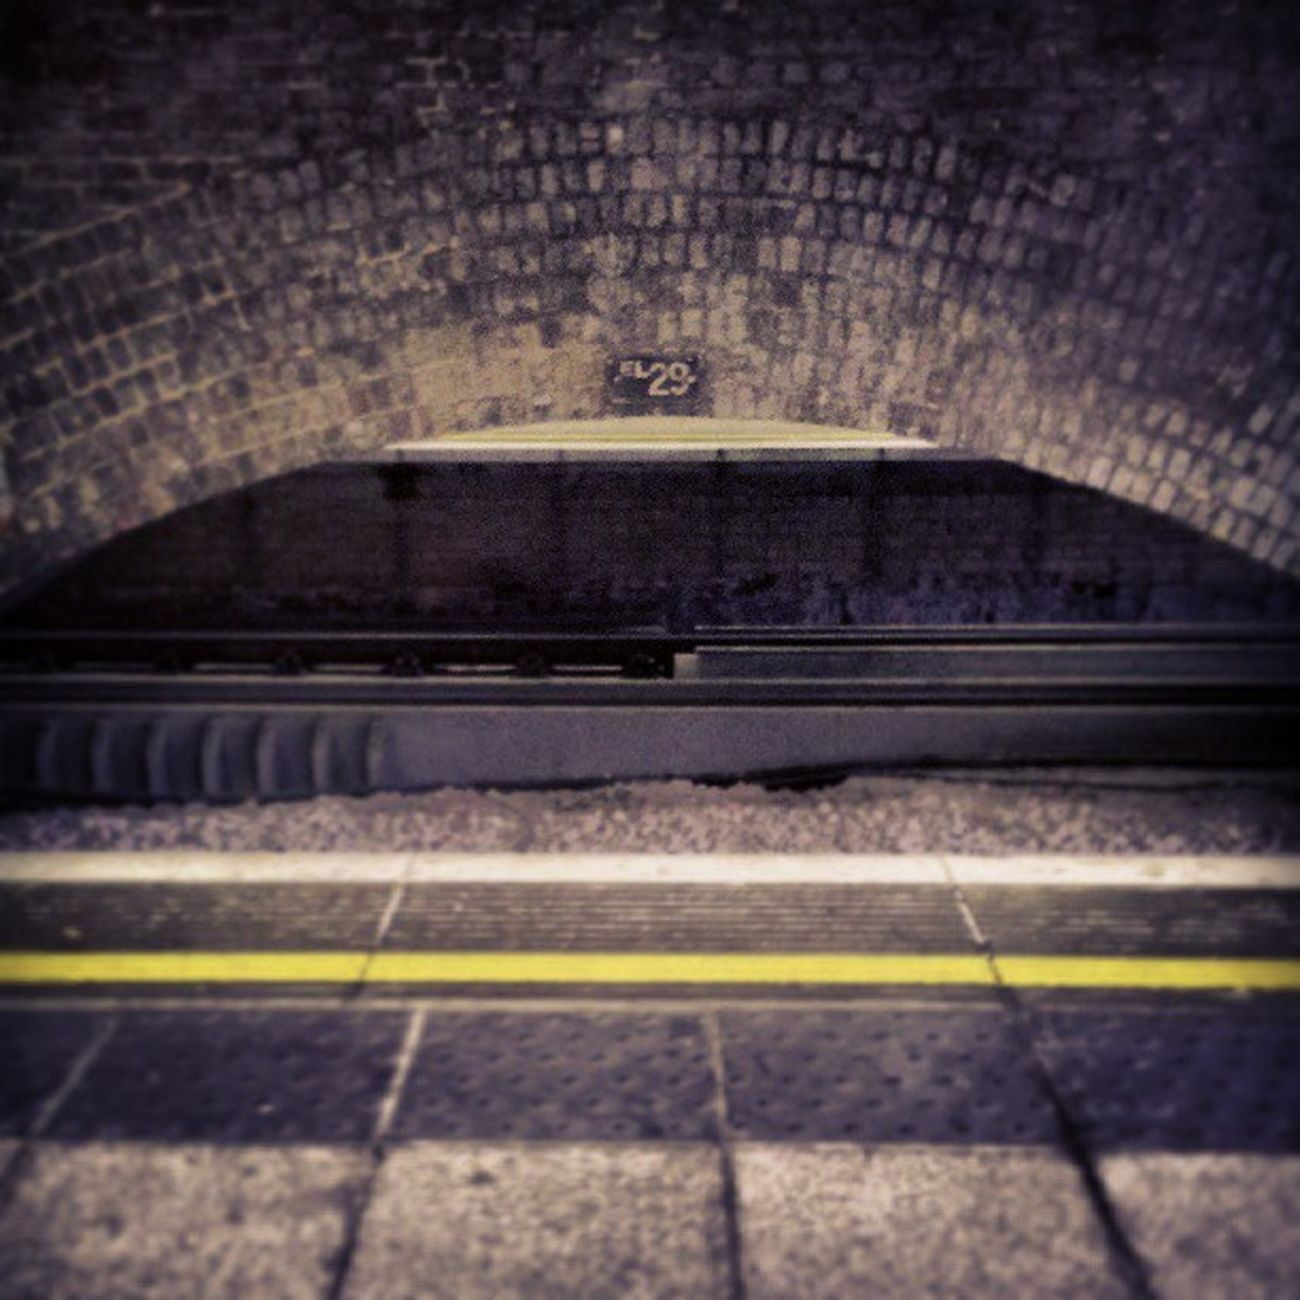 Bricks Brick Arch Brickarch brickarchitecture brickarches brickarchway railway platform yellowline yellowlines surreyquays surreyquaysstation selondon selondonforever